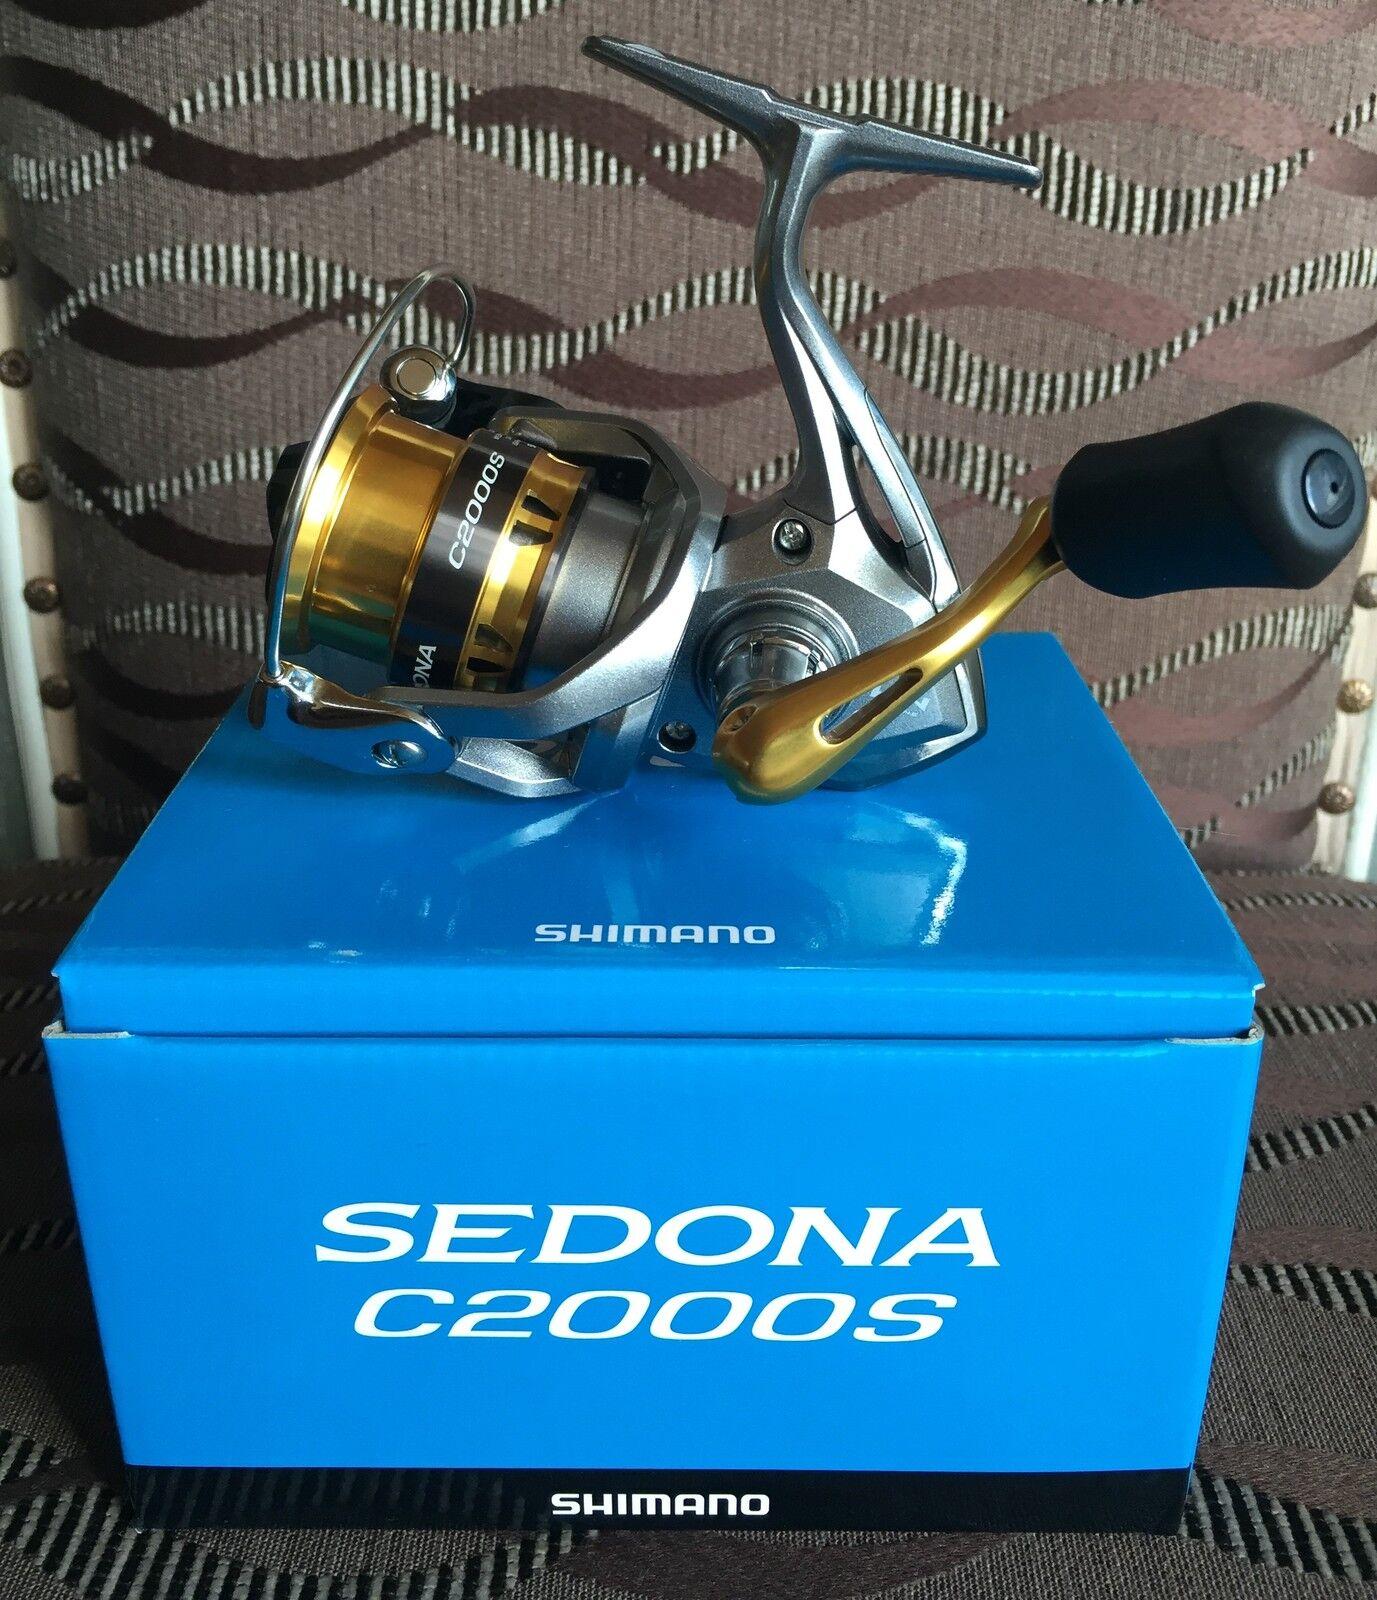 Shimano  Sedona C2000S FI Spinnrolle  first-class service